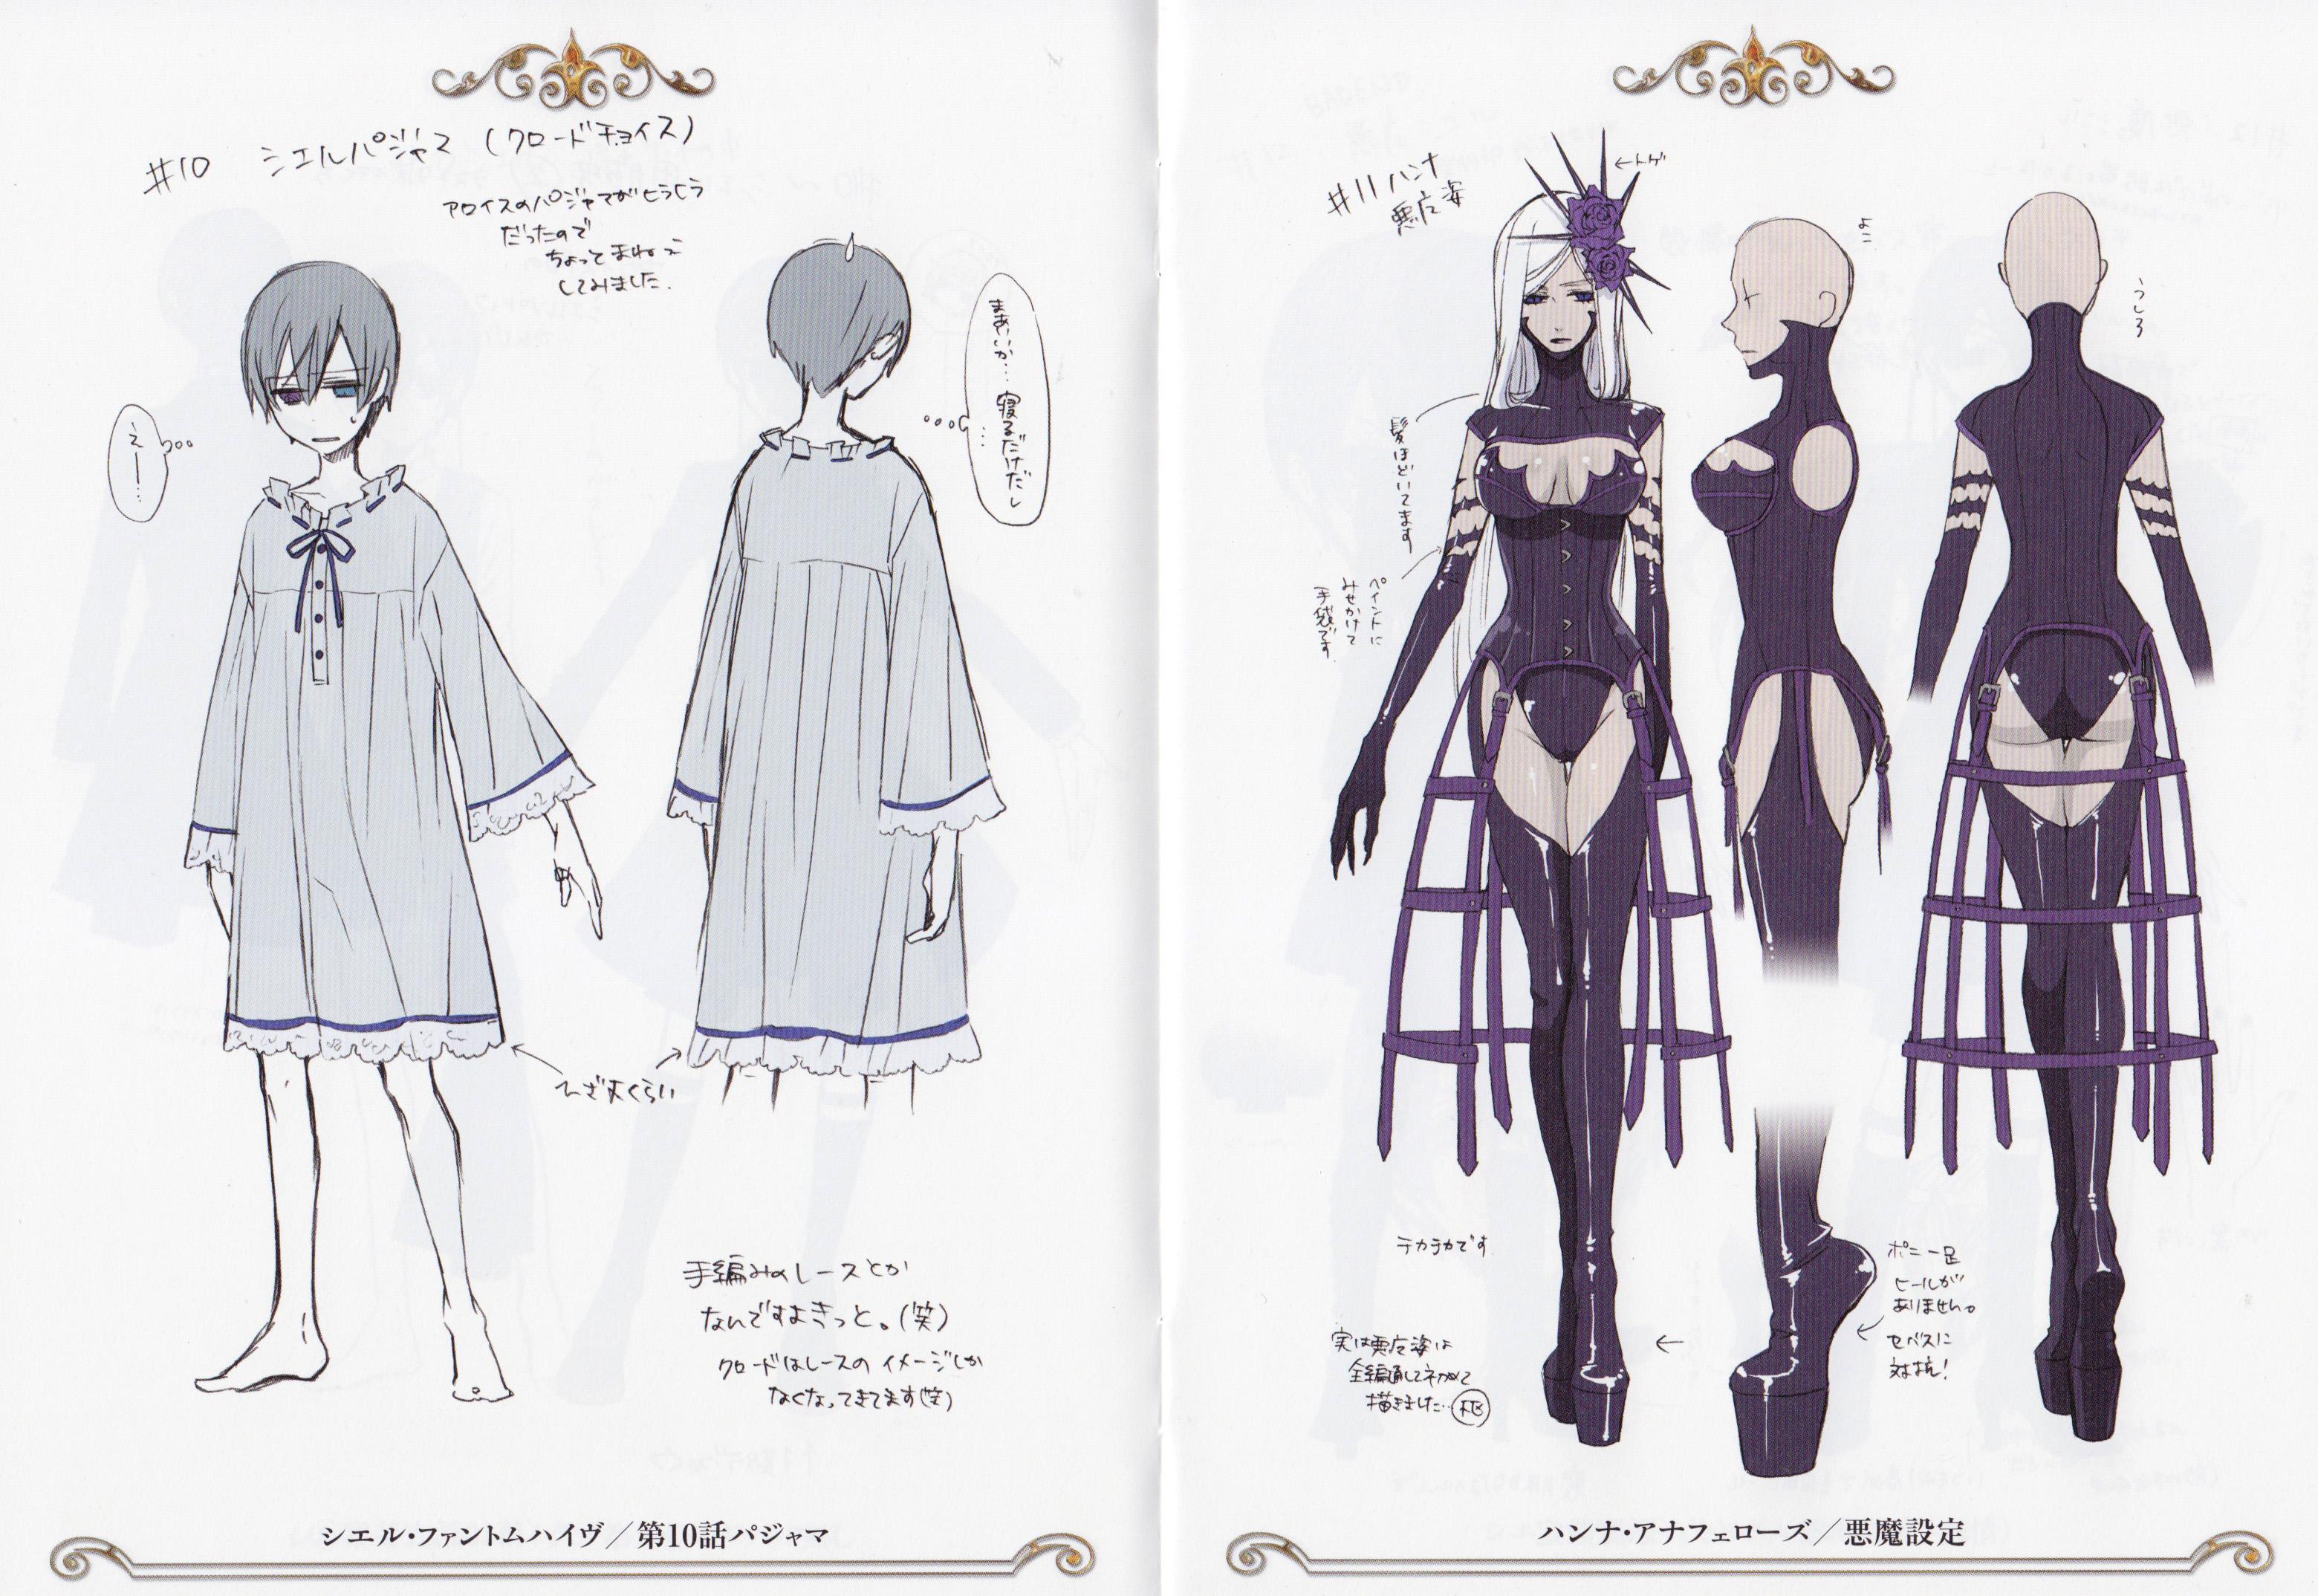 Ciel Phantomhive - Night Gown (Alois) Outfit + Hannah Anafeloz ...